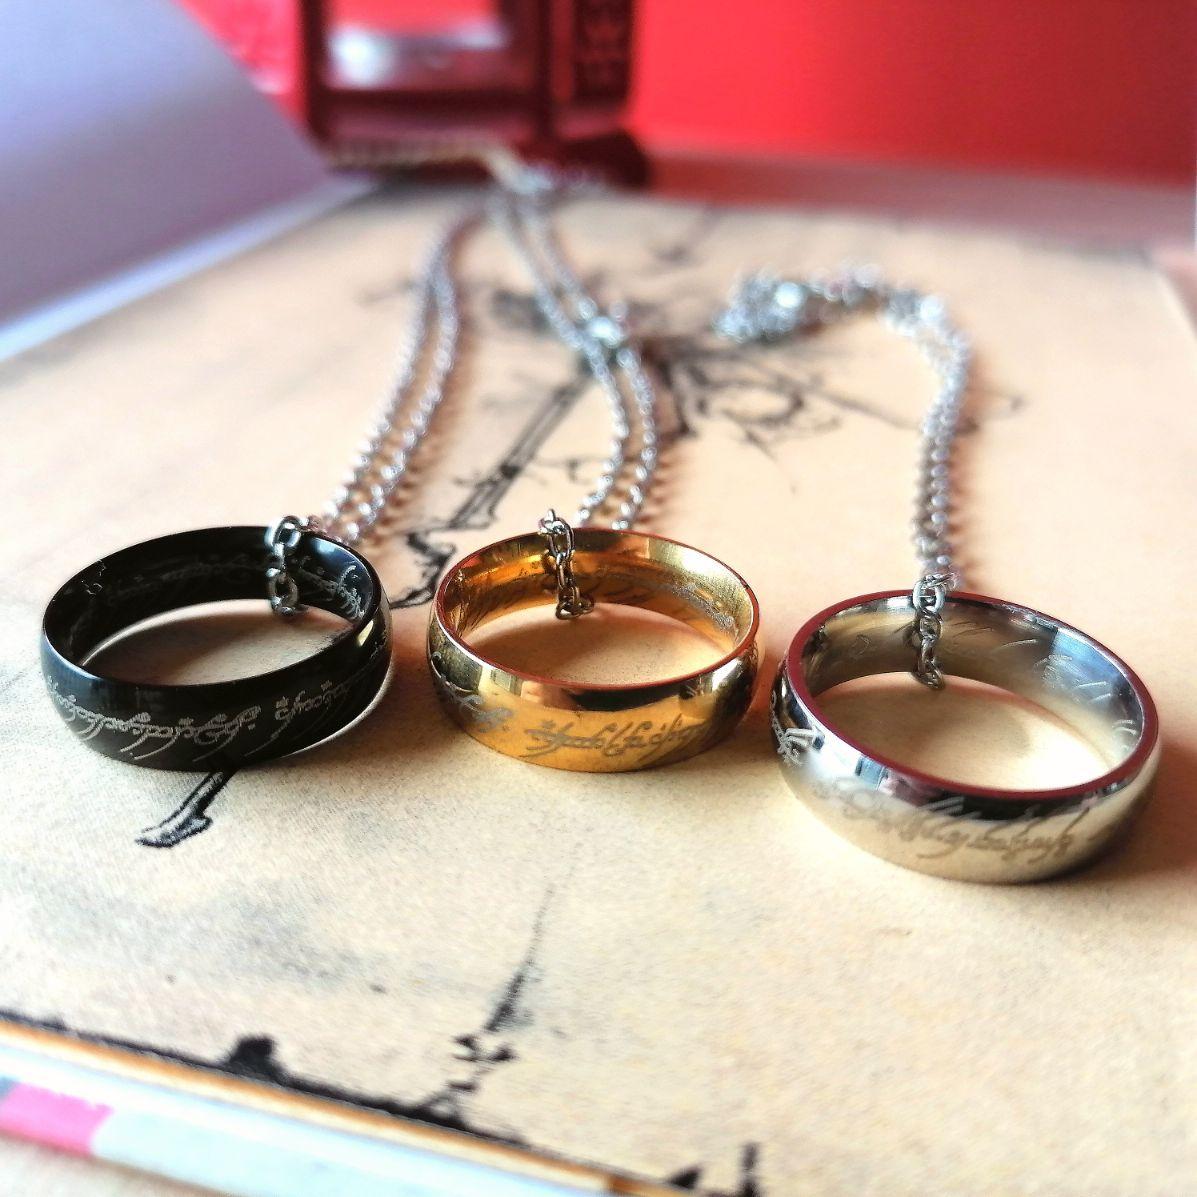 Gospodar prstenova Poklon Prstenje Set